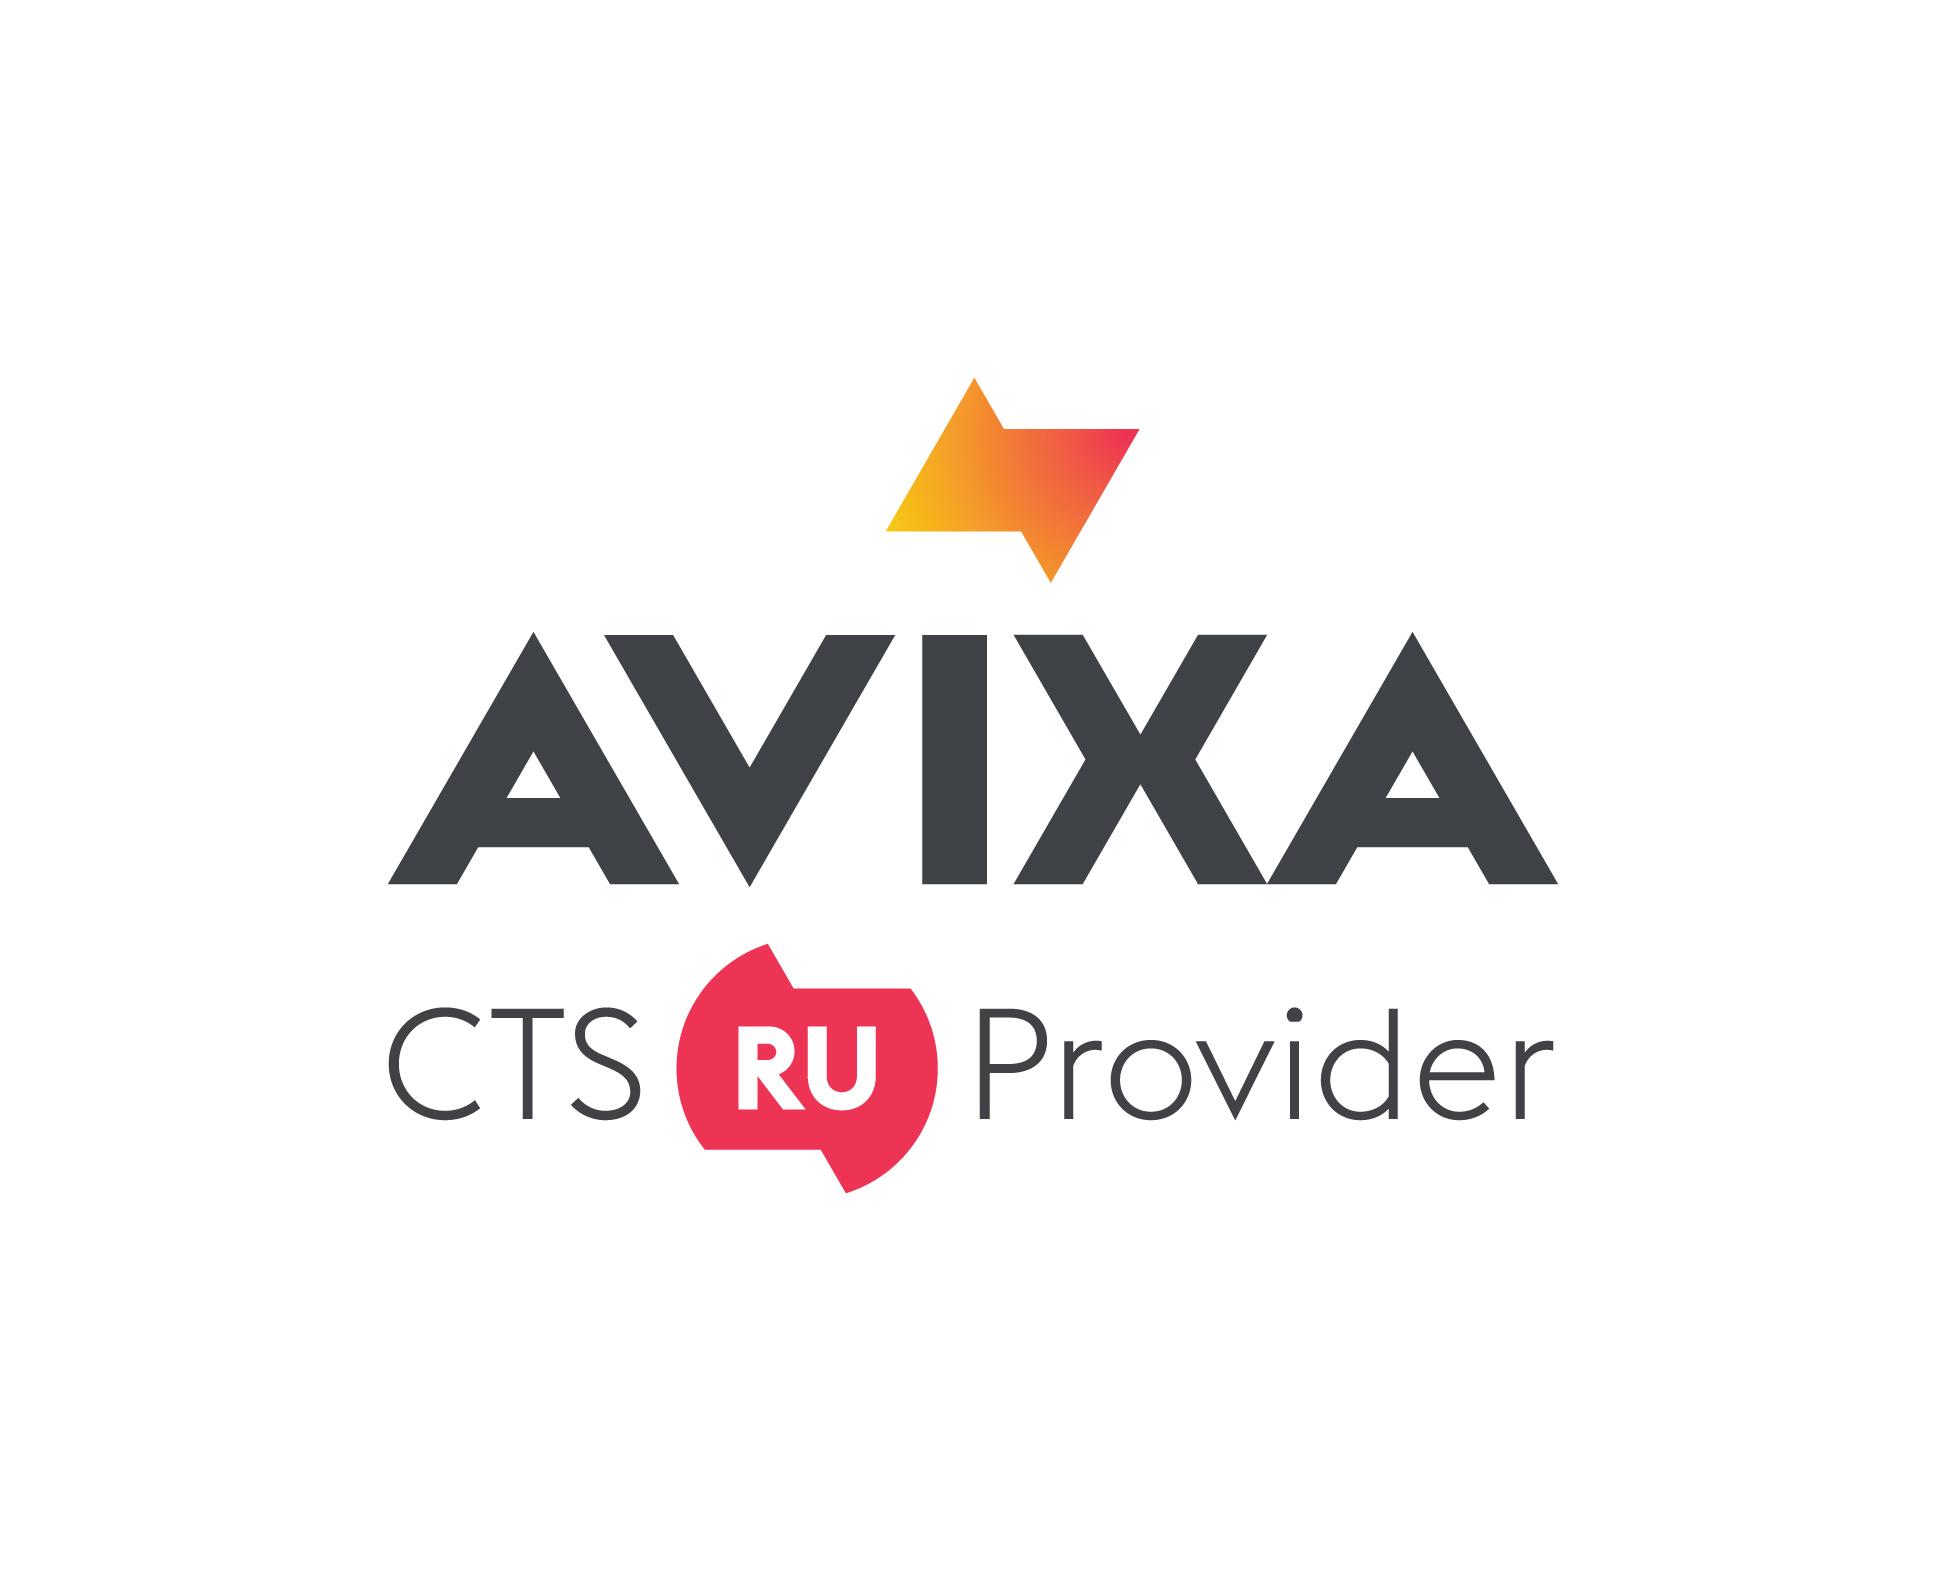 AVIXA_CTSRUPROVIDER.jpg#asset:3078